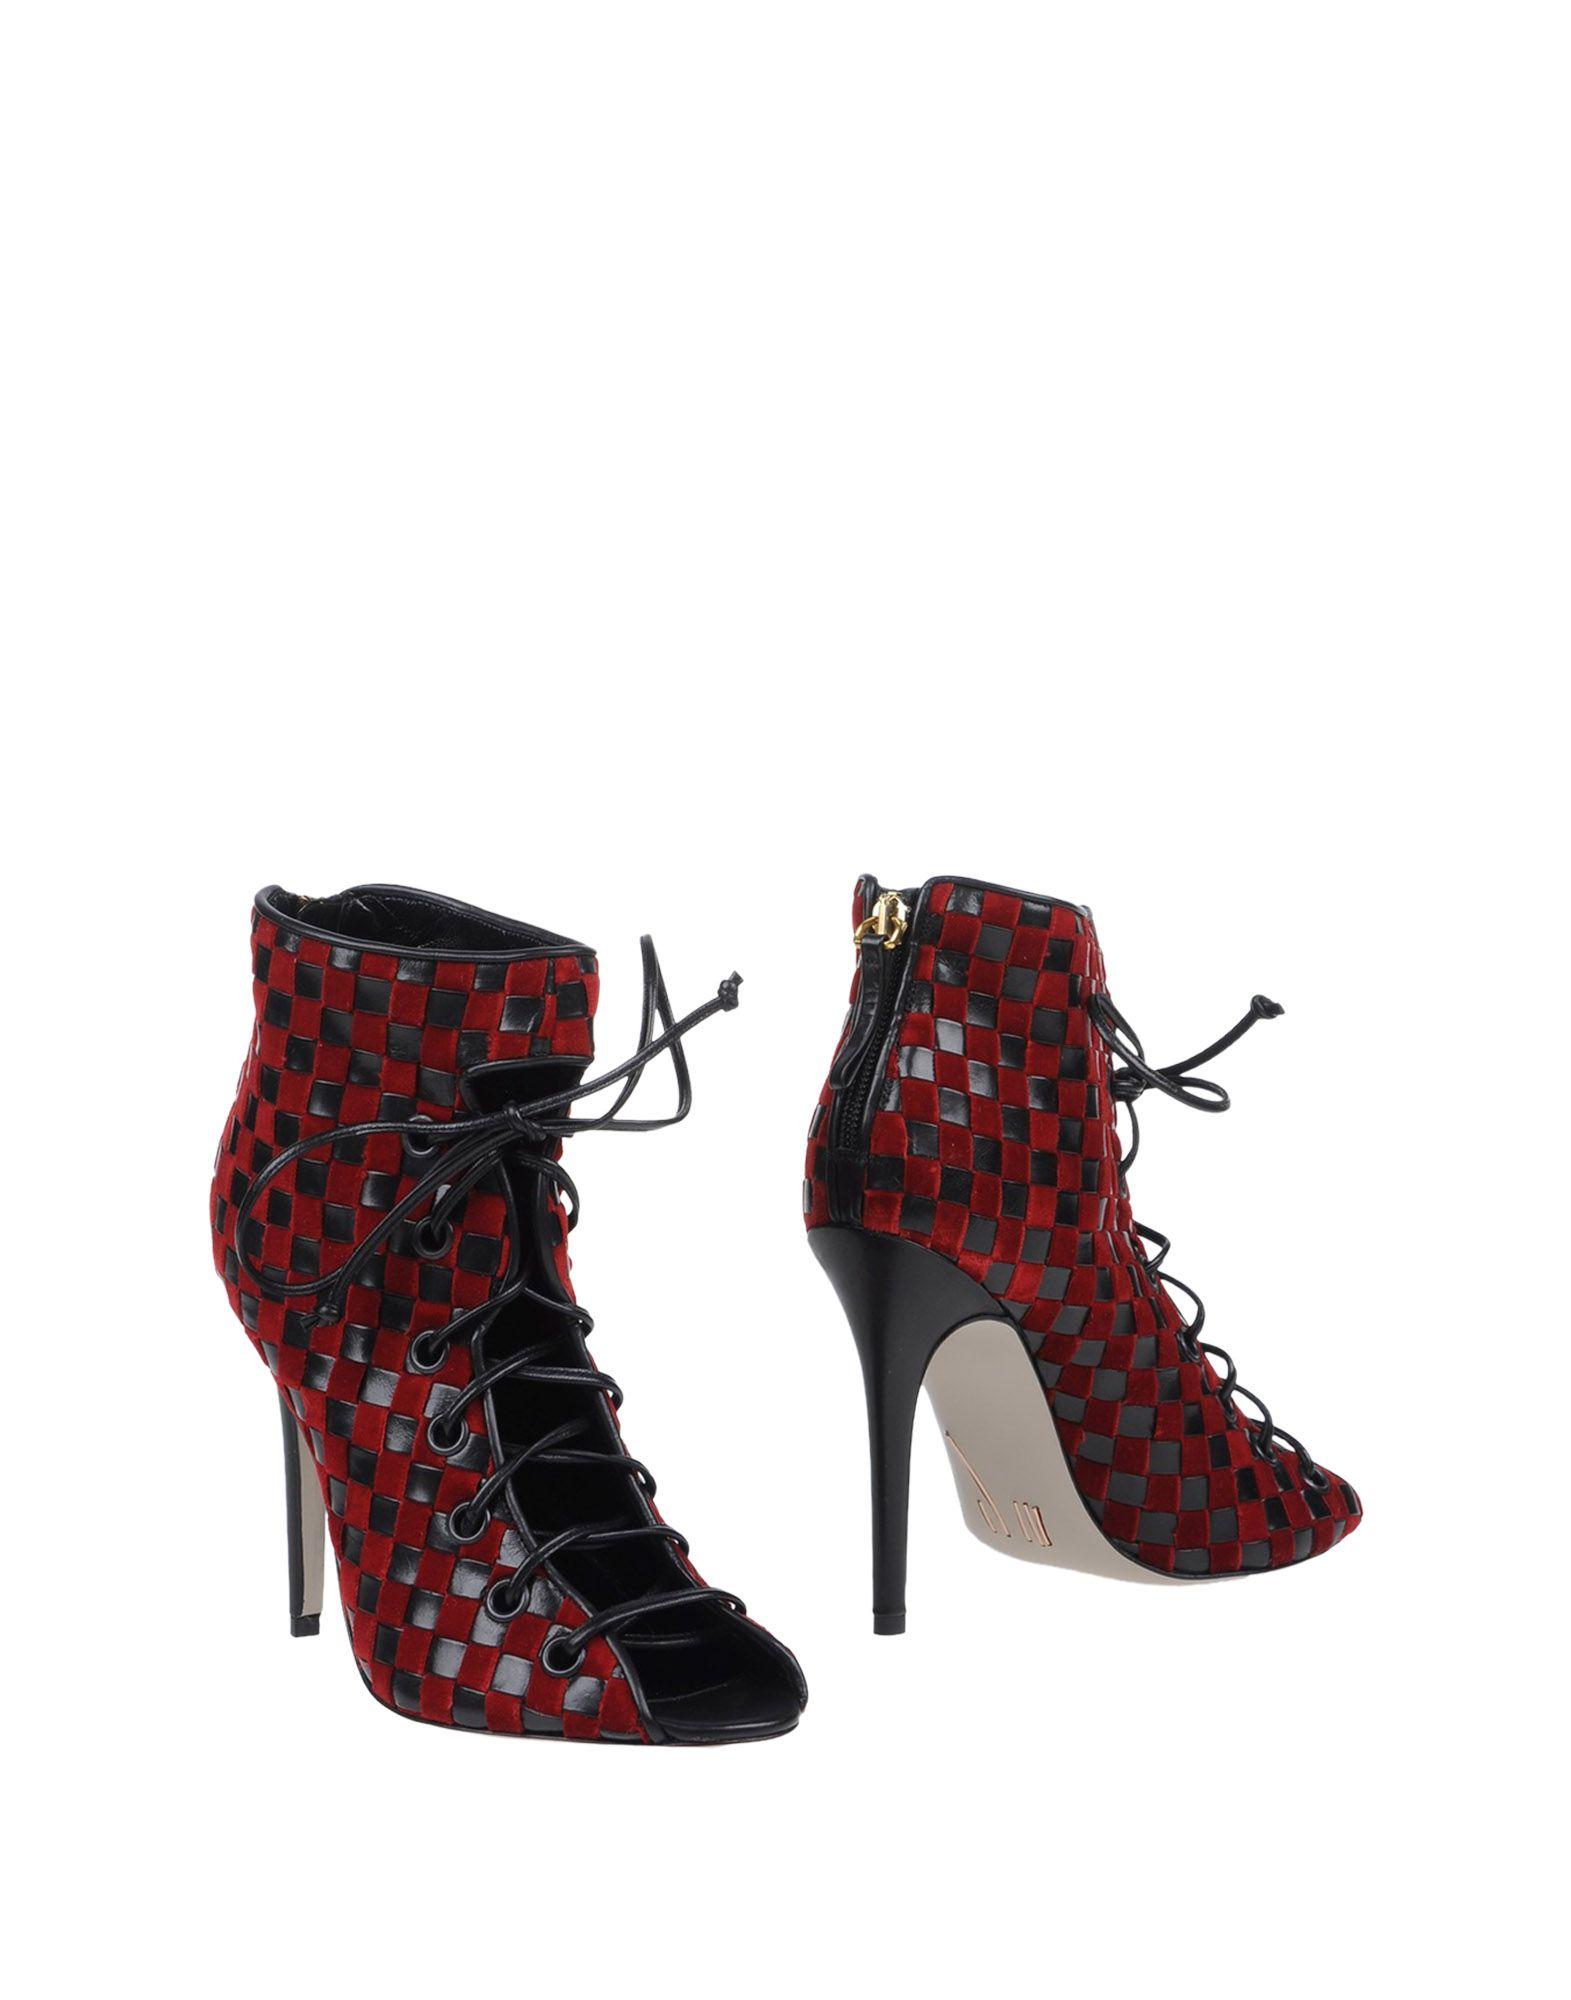 DANIELE MICHETTI Полусапоги и высокие ботинки daniele michetti daniele michetti ботильоны женские 134